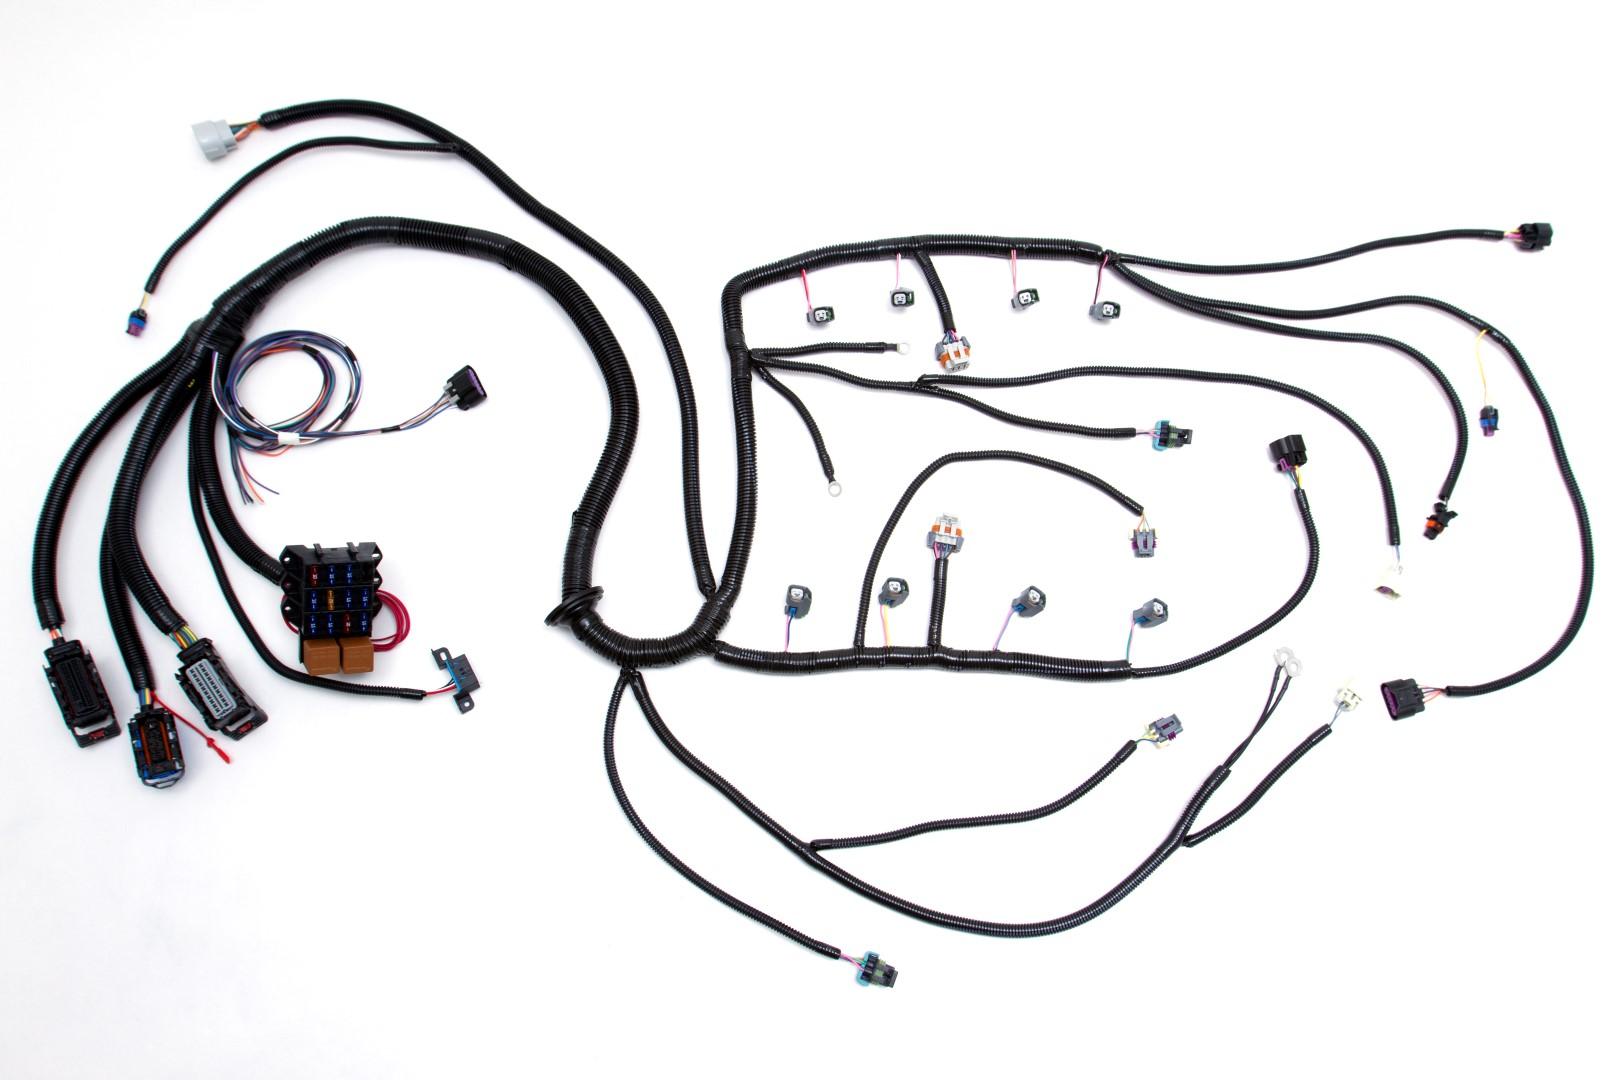 8E1097A73090570145AAE6C191051500 08 '09 l76 (6 0l) standalone wiring harness w 4l60e custom 4l60e wiring harness diagram at bakdesigns.co